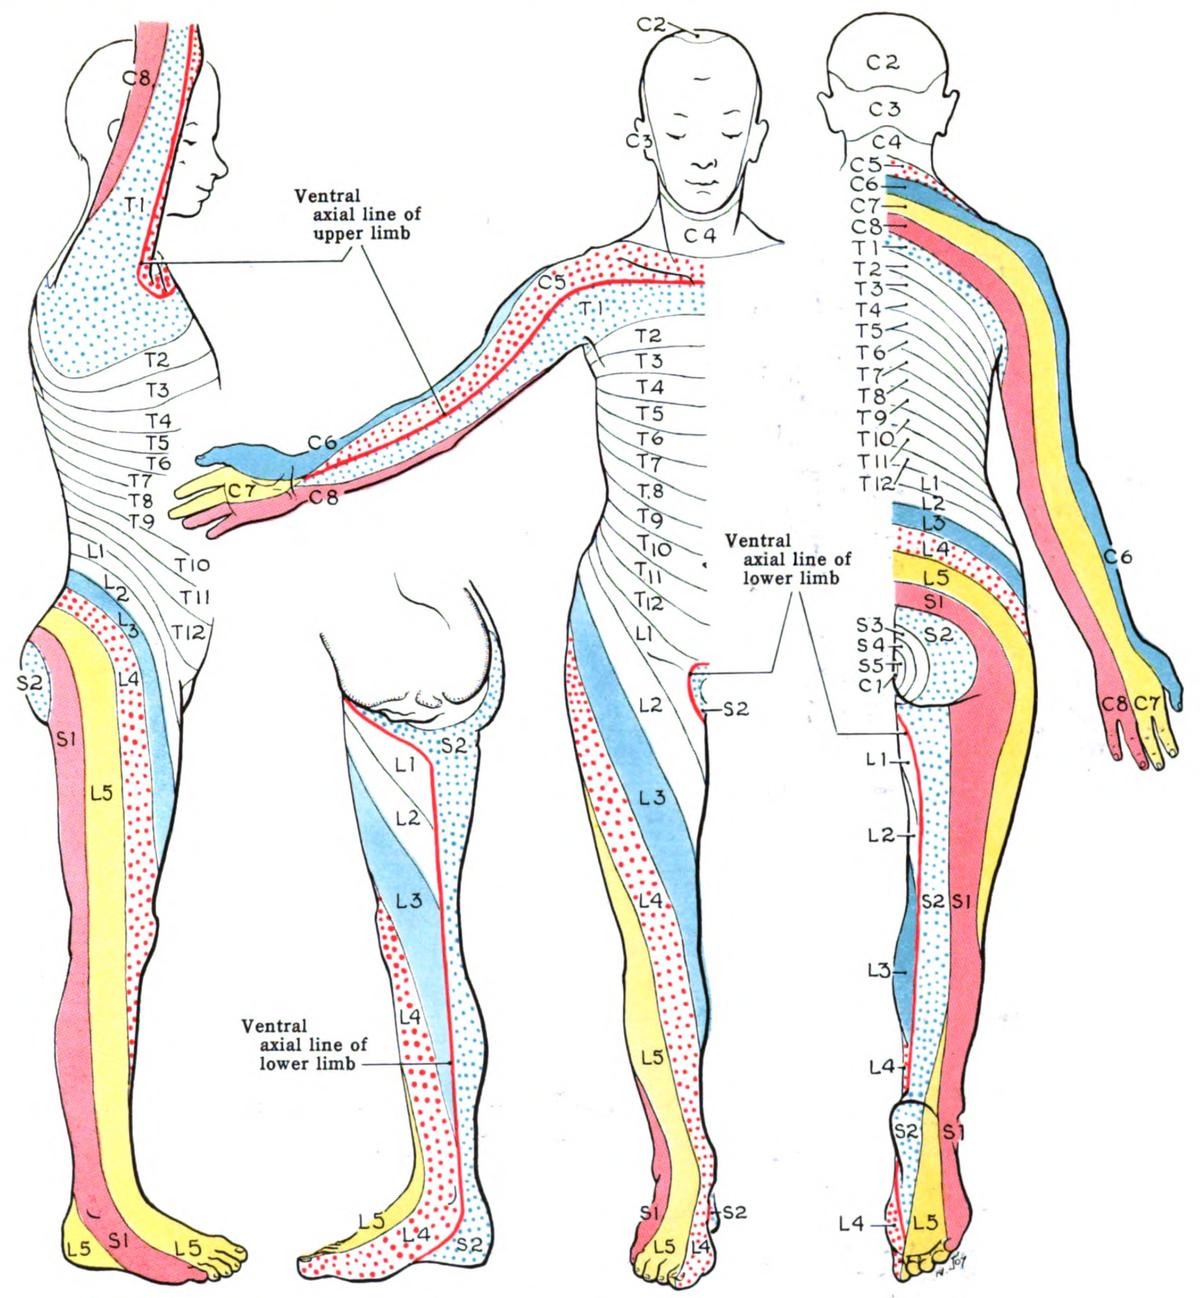 Dermatome (anatomy) Wikipedia - 1200x1298 - png | Medical ...